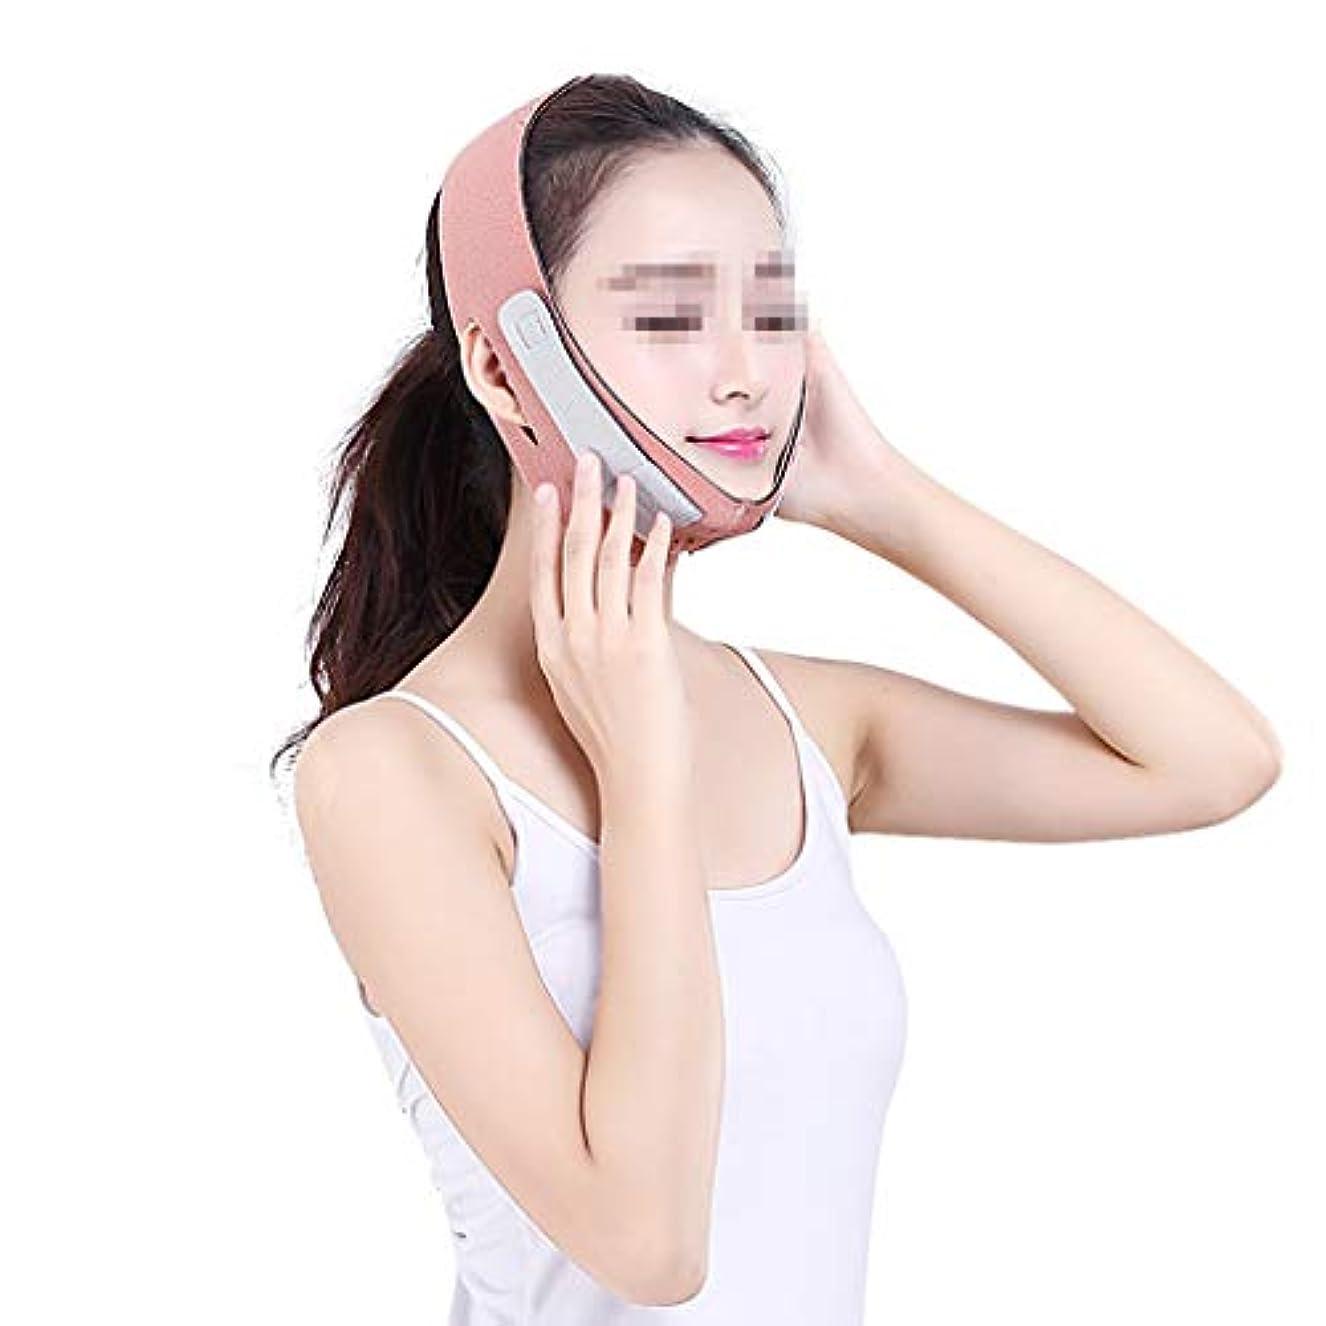 XHLMRMJ 顔の持ち上がる睡眠のV顔の包帯、マスクの顔の顔のマッサージャーのあごの顔の持ち上がる顔の持ち上がる顔の持ち上がる機械